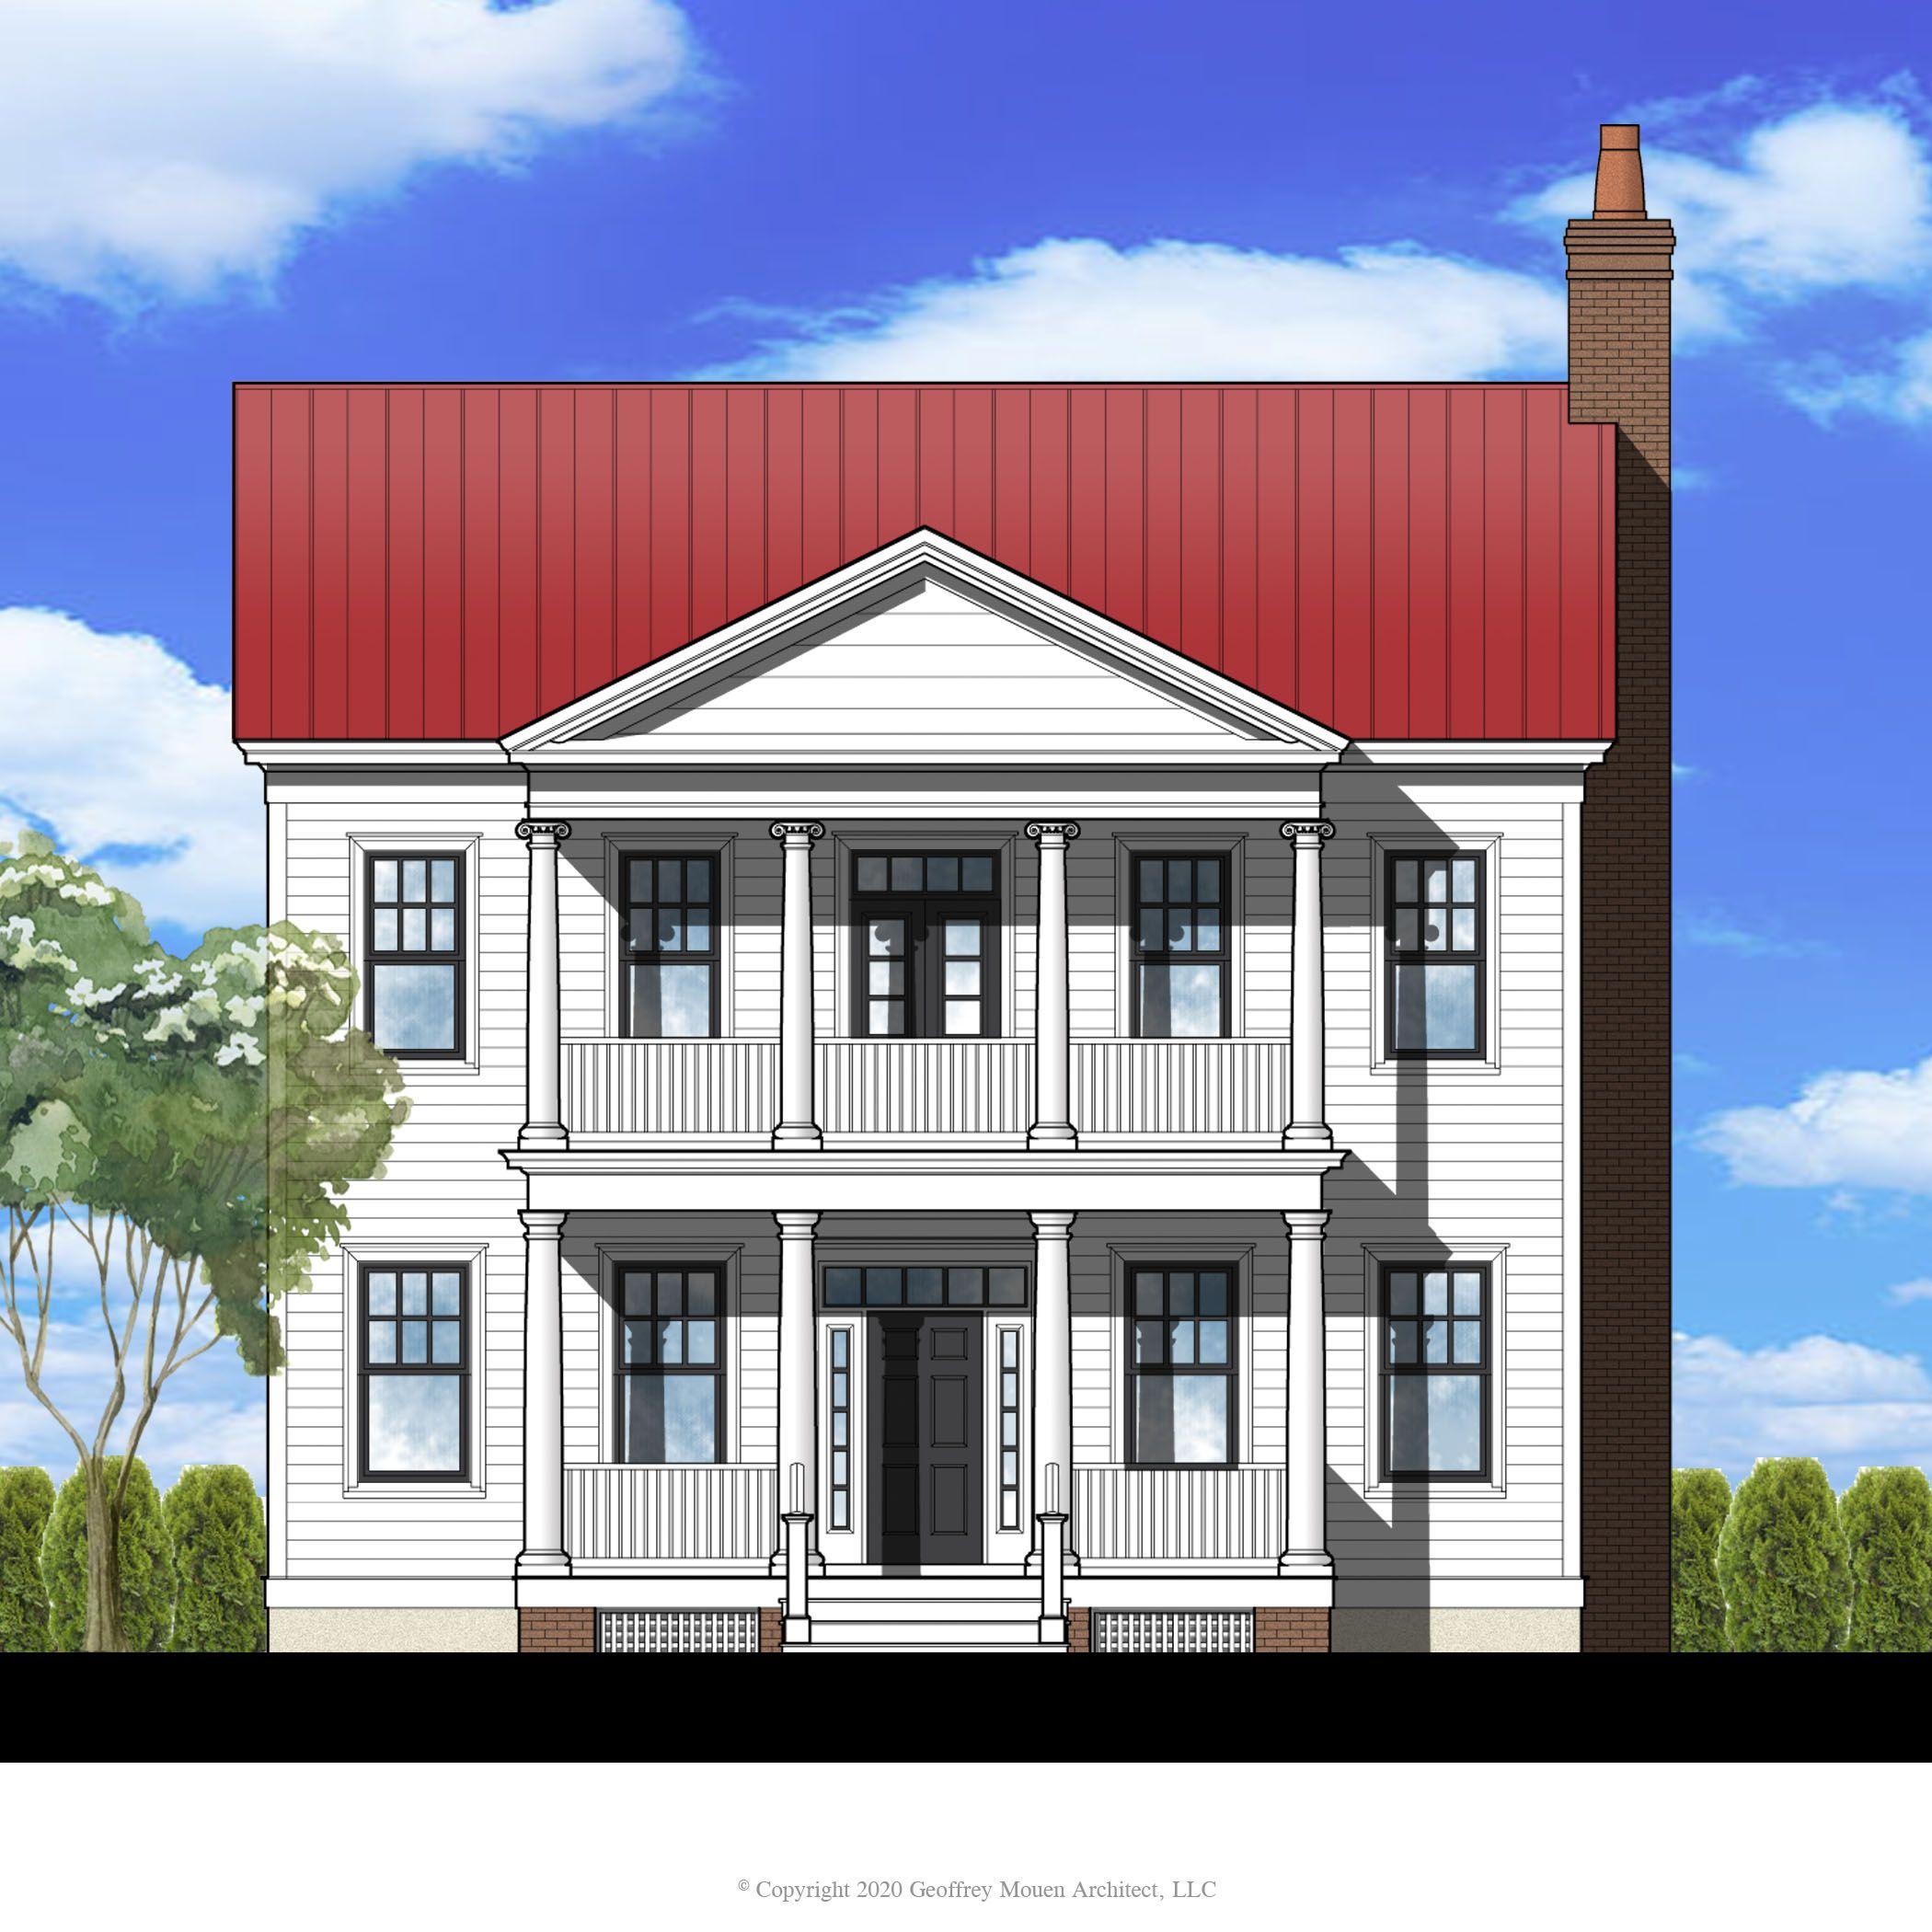 Gm001 House Plan Gm001 Design From Allison Ramsey Architects In 2020 Architect House Plans House